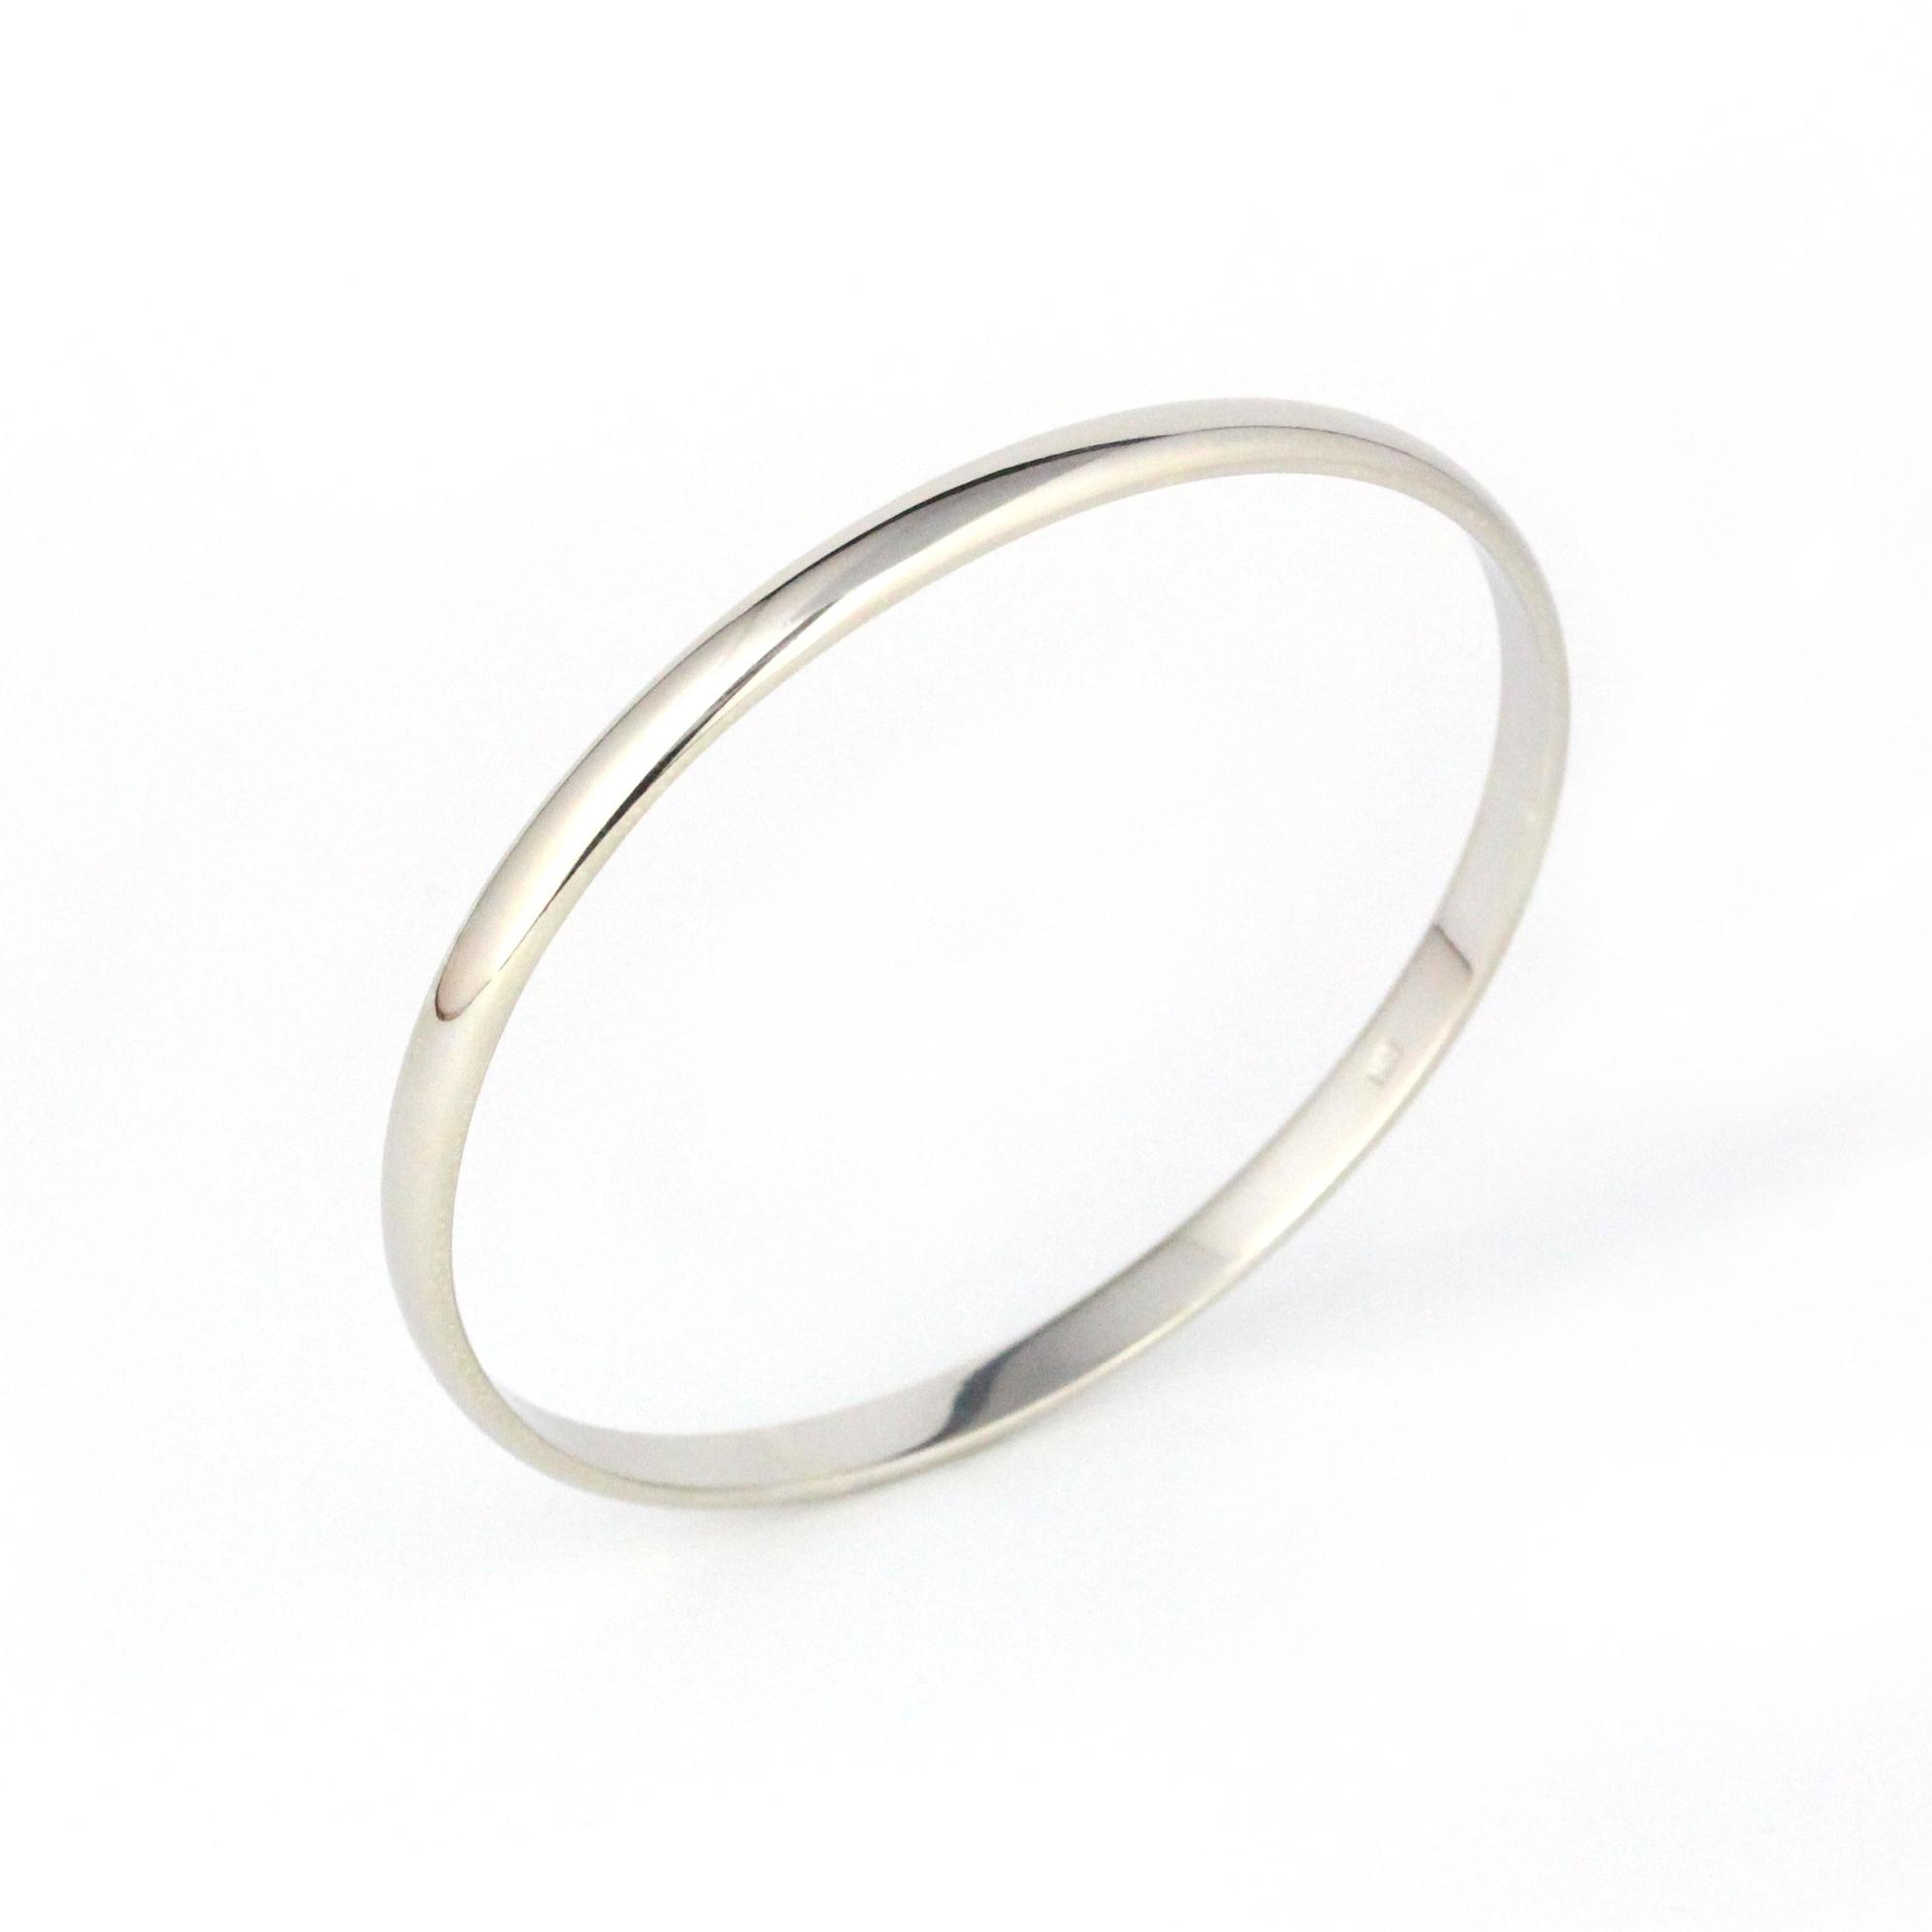 Thick white gold half round bangle.